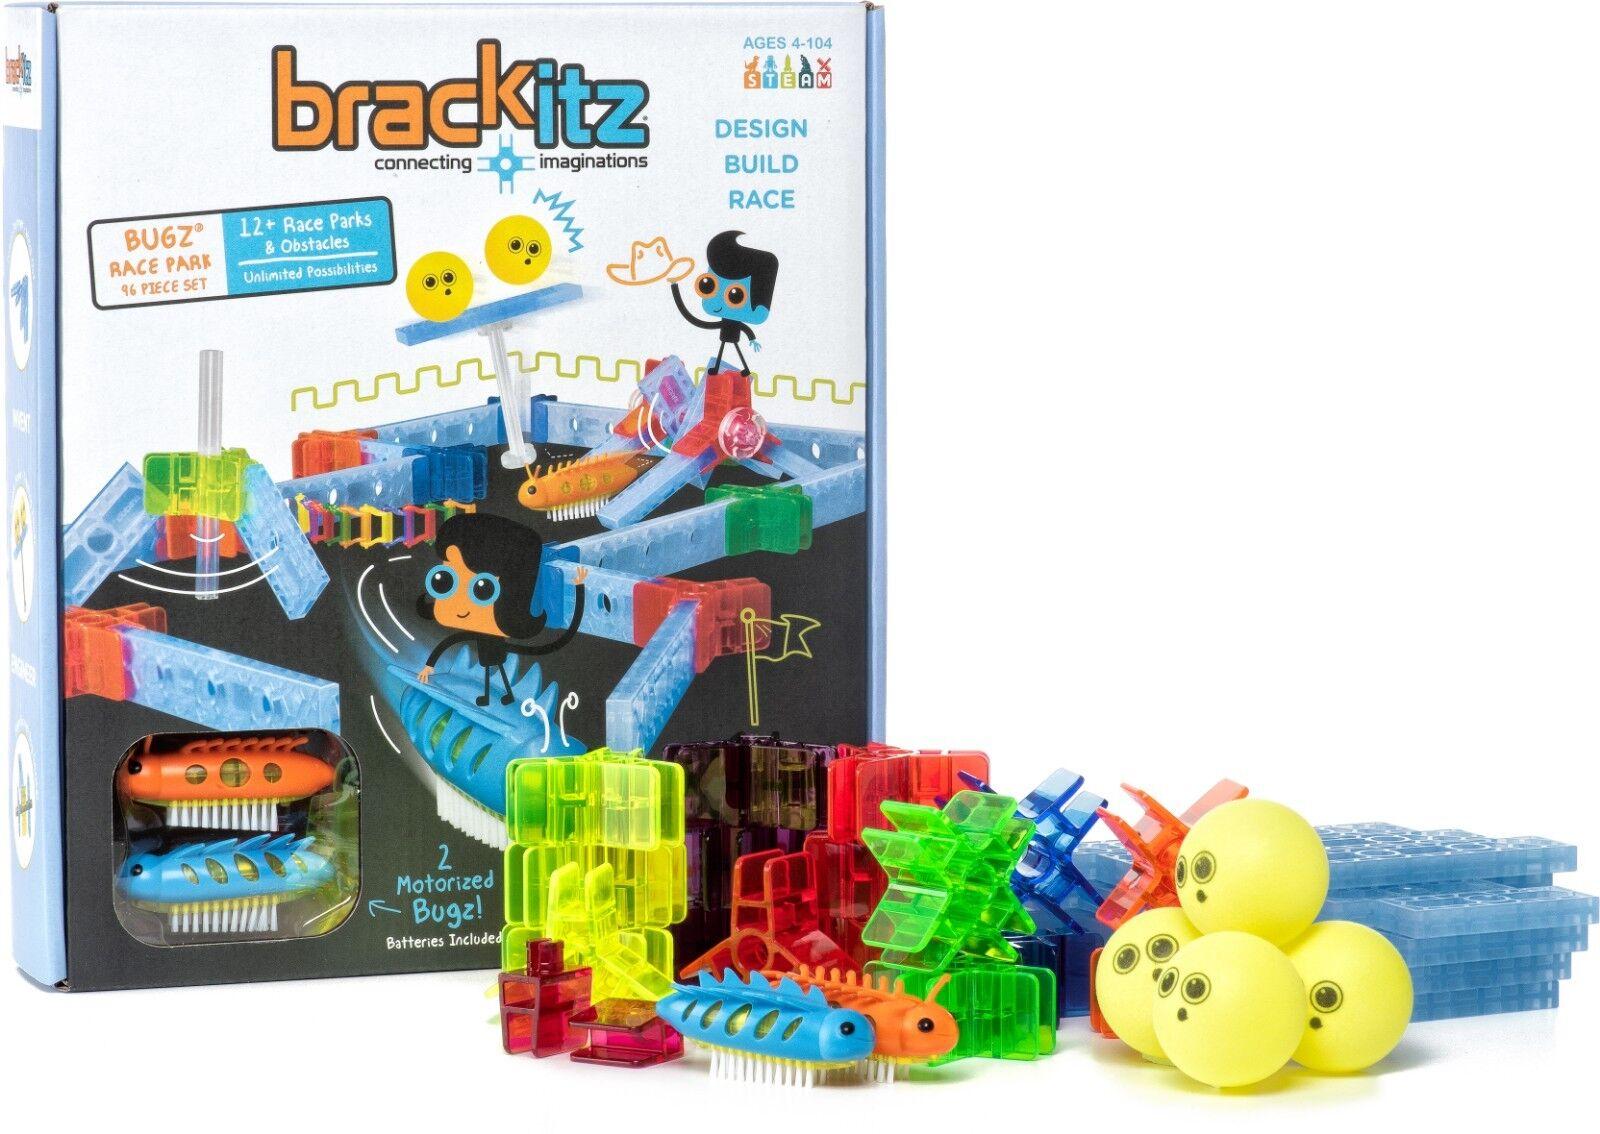 96-pc-brackitz-bugz-race-park-stem-learning-toy-set-for-kids-4-homeschool